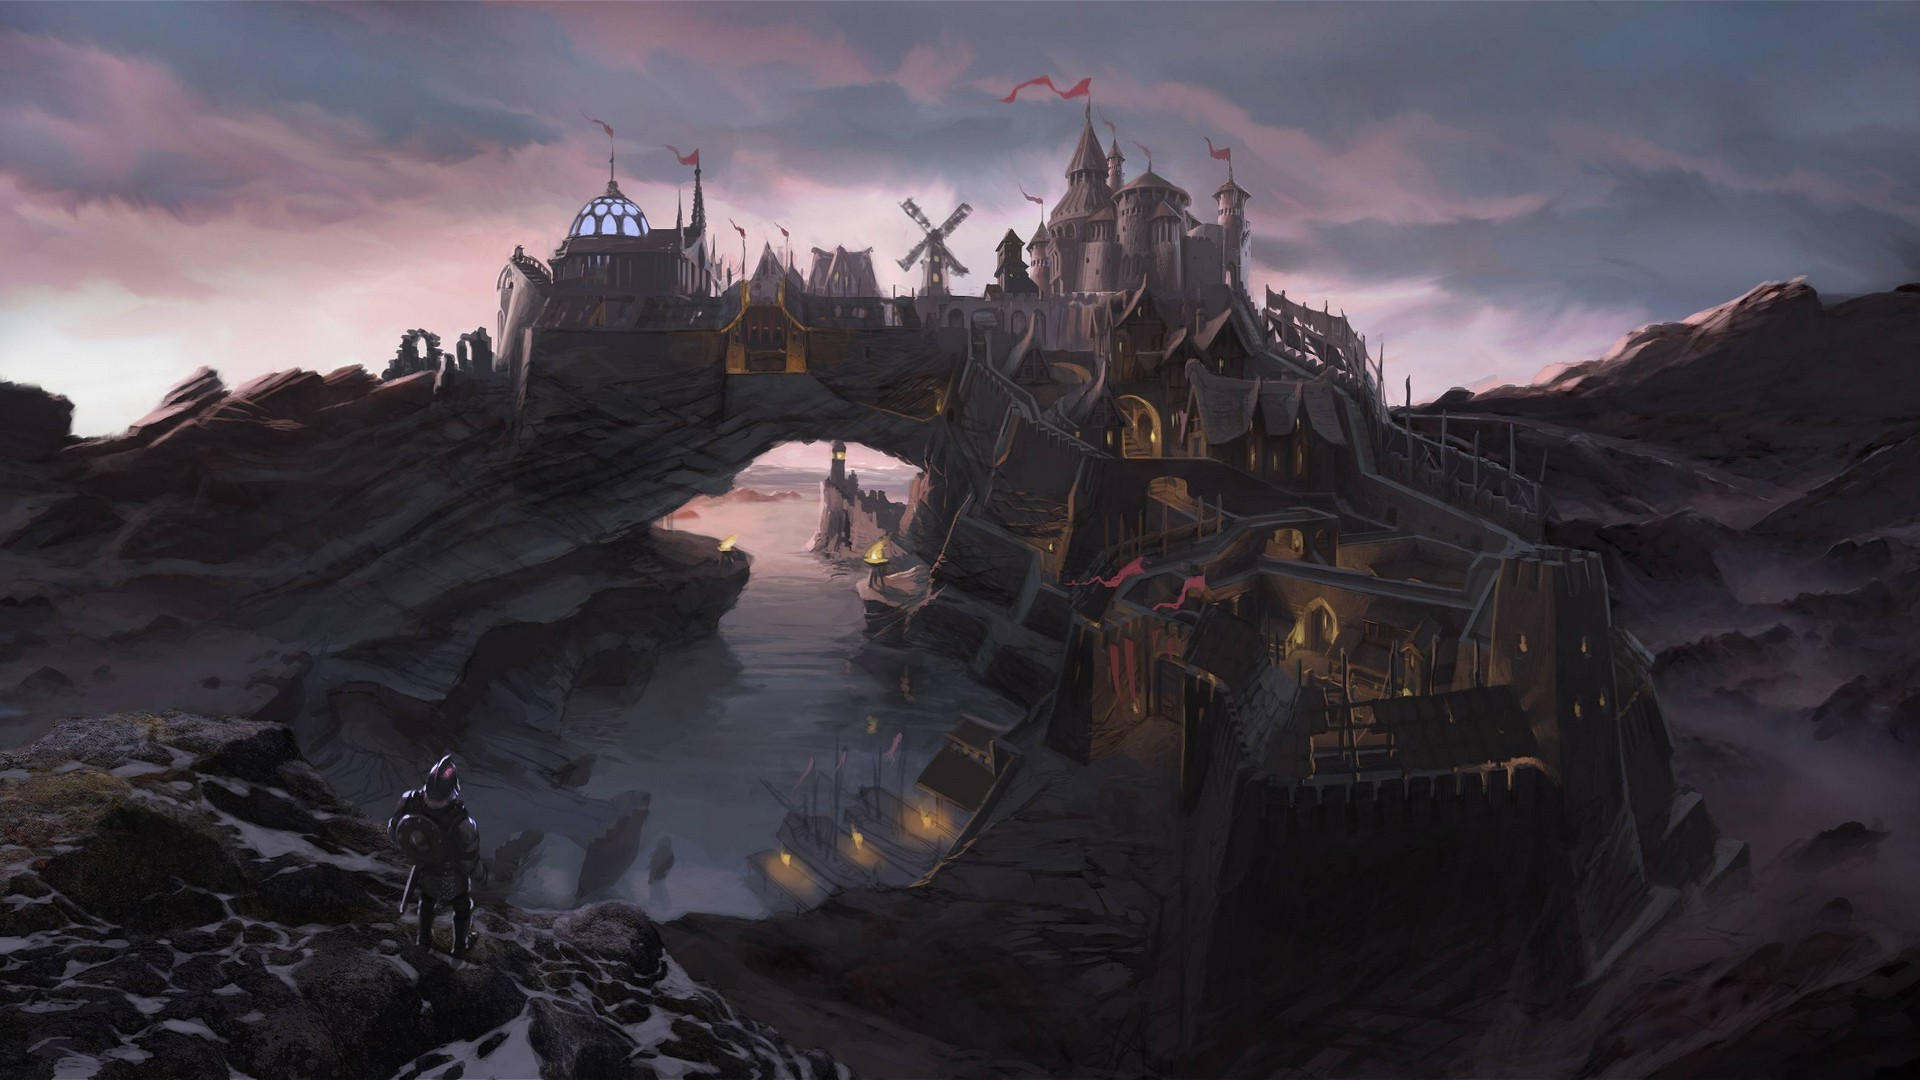 The Elder Scrolls V: Skyrim, City, Fantasy Art, Video Games Wallpapers HD /  Desktop and Mobile Backgrounds